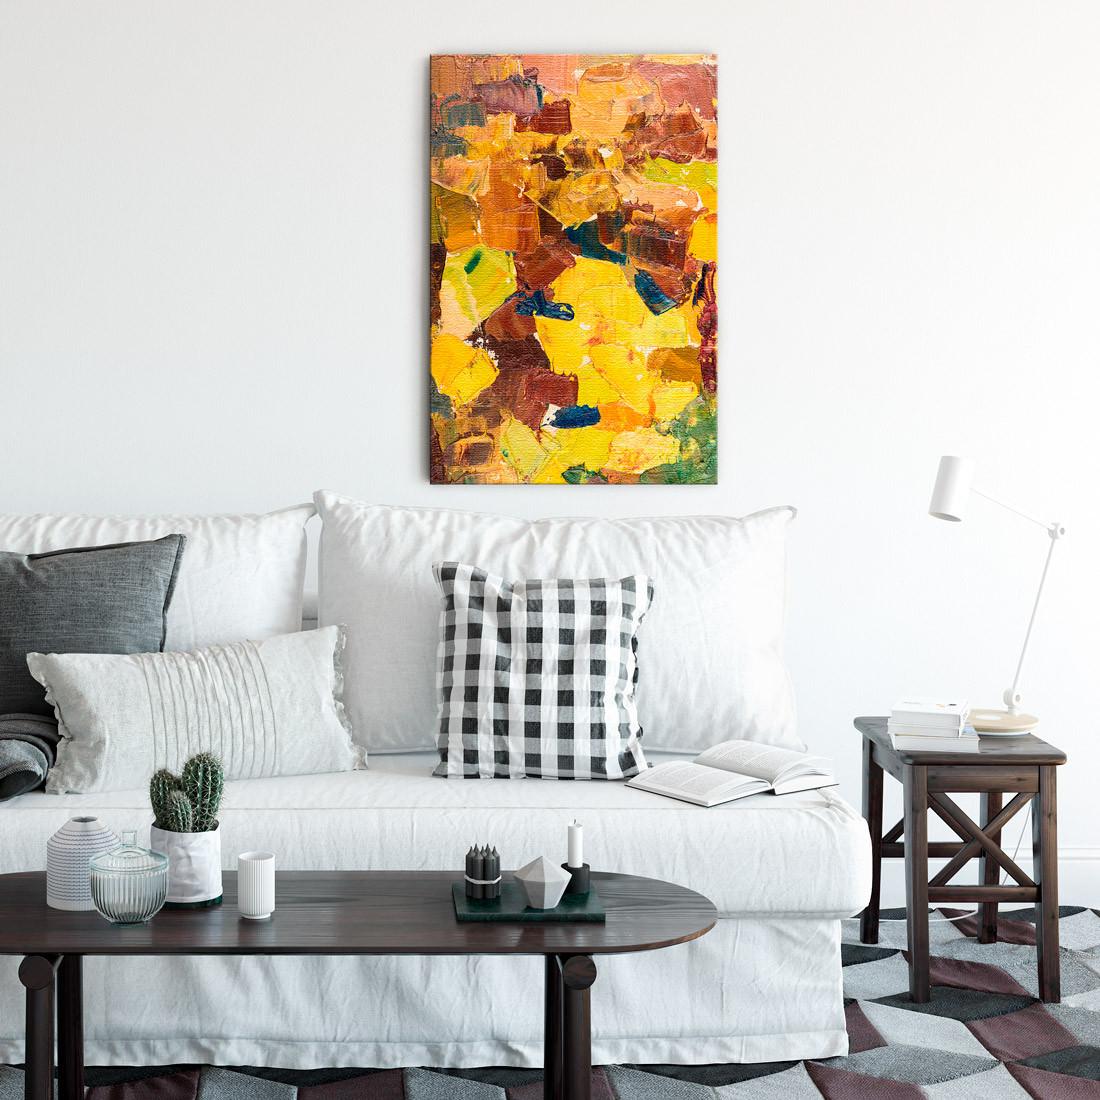 Quadro Decorativo Pintura Abstrata Tons de Amarelo e Marrom